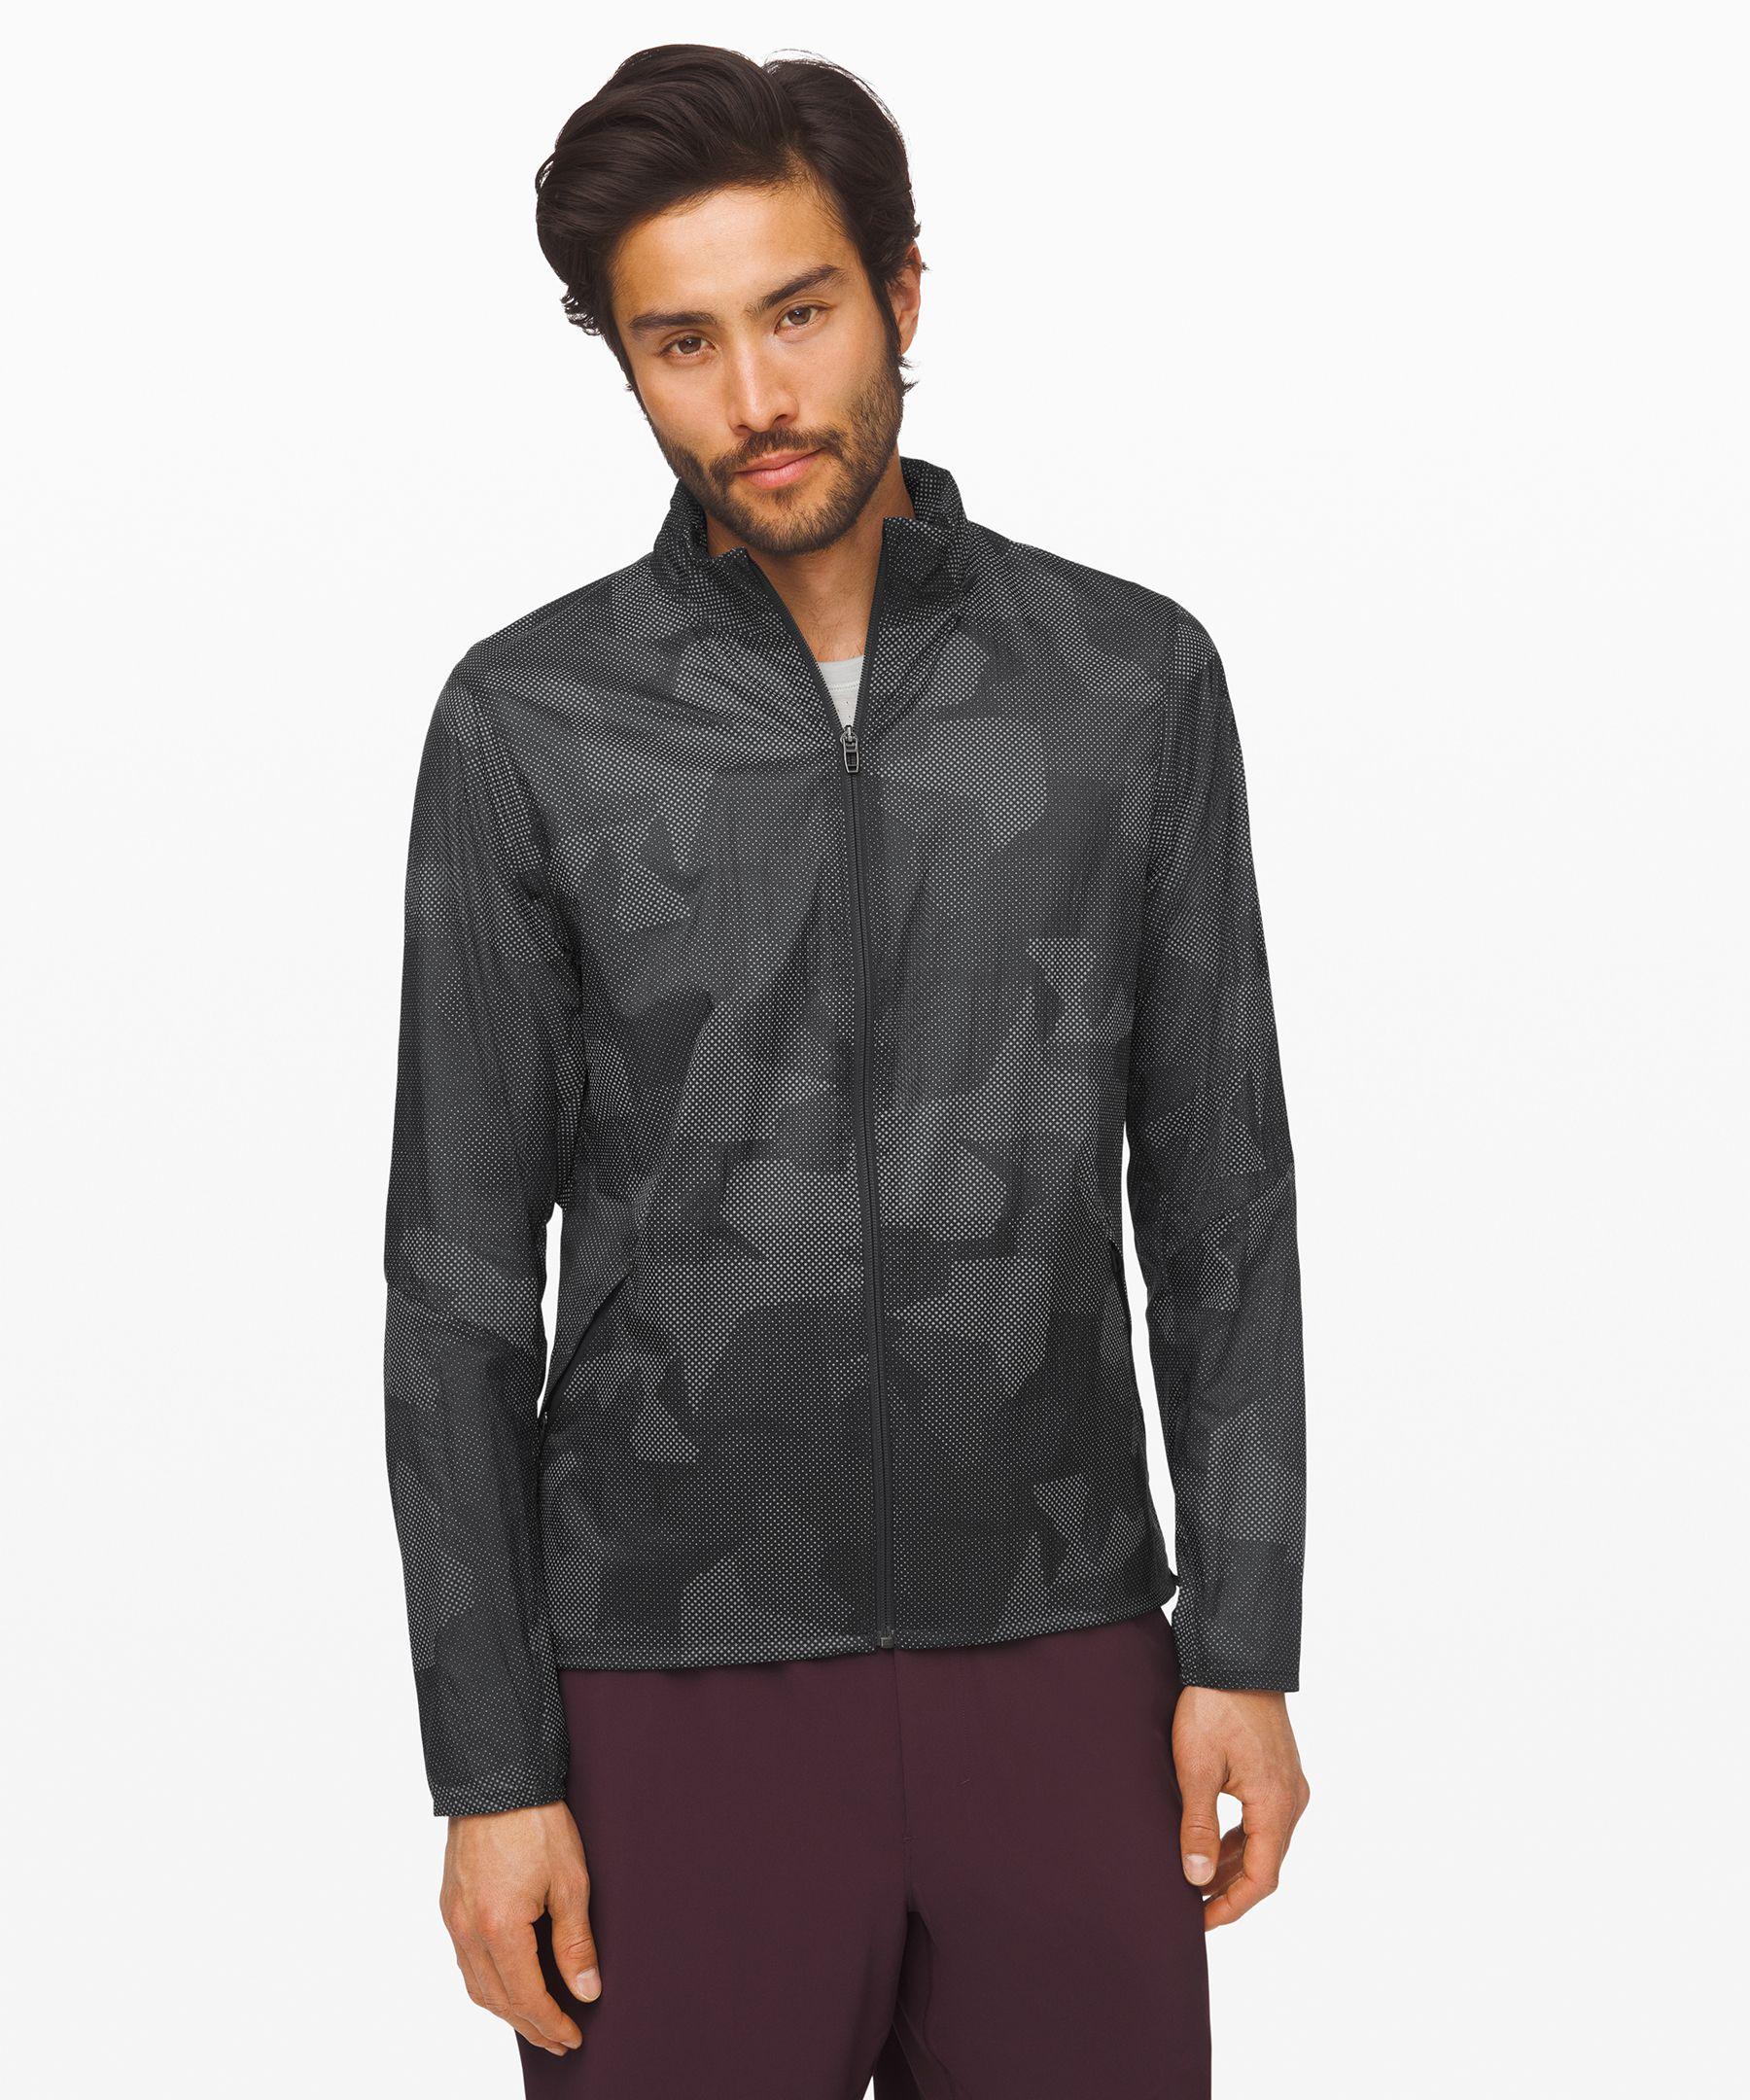 Active Jacket *Reflective